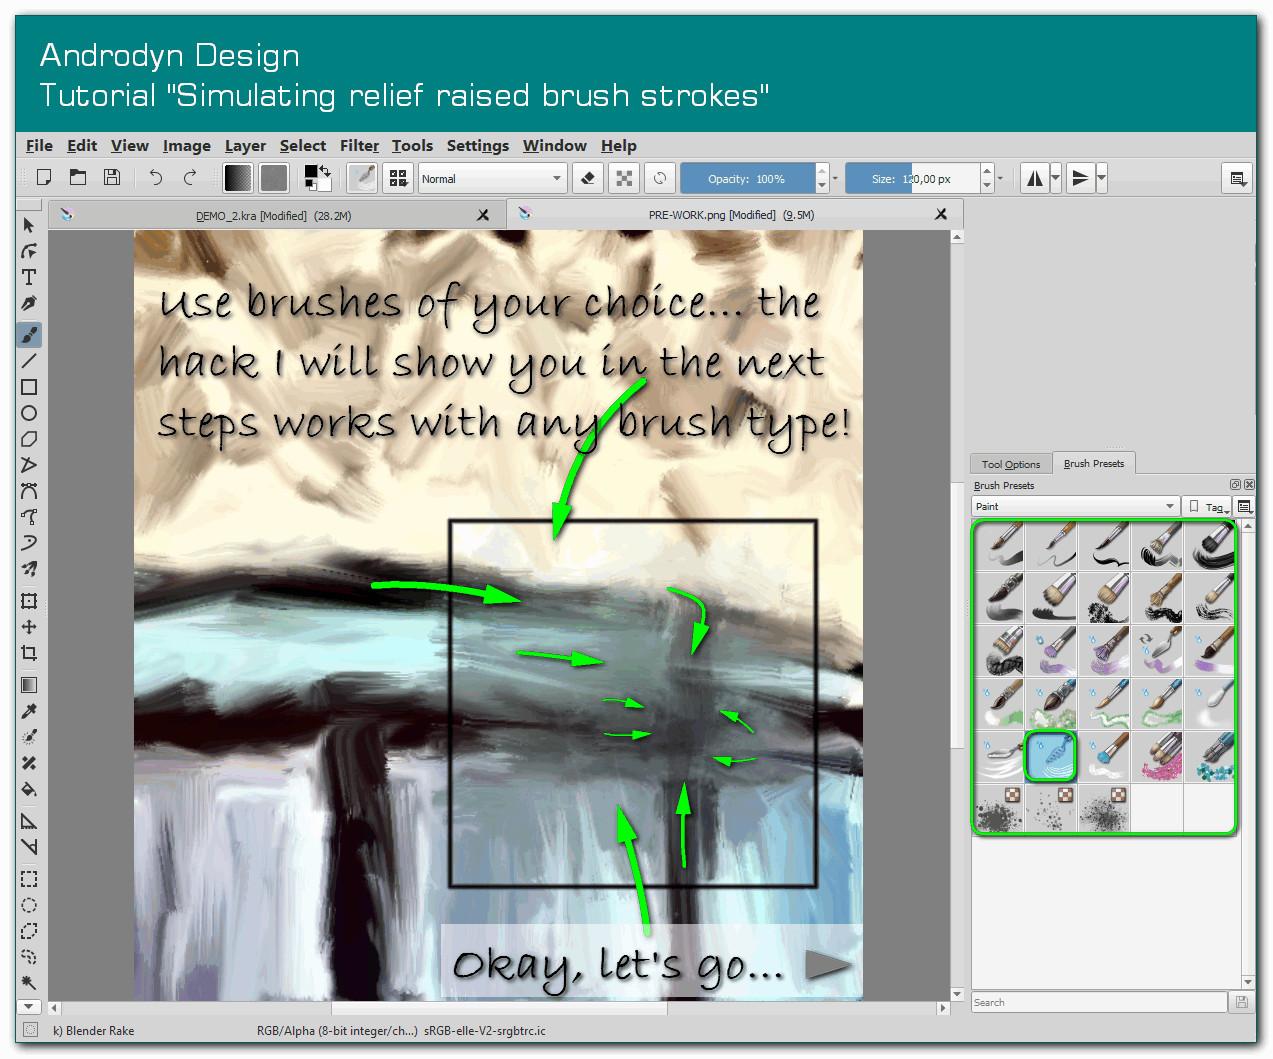 ArtStation - Tutorial in 12 steps: